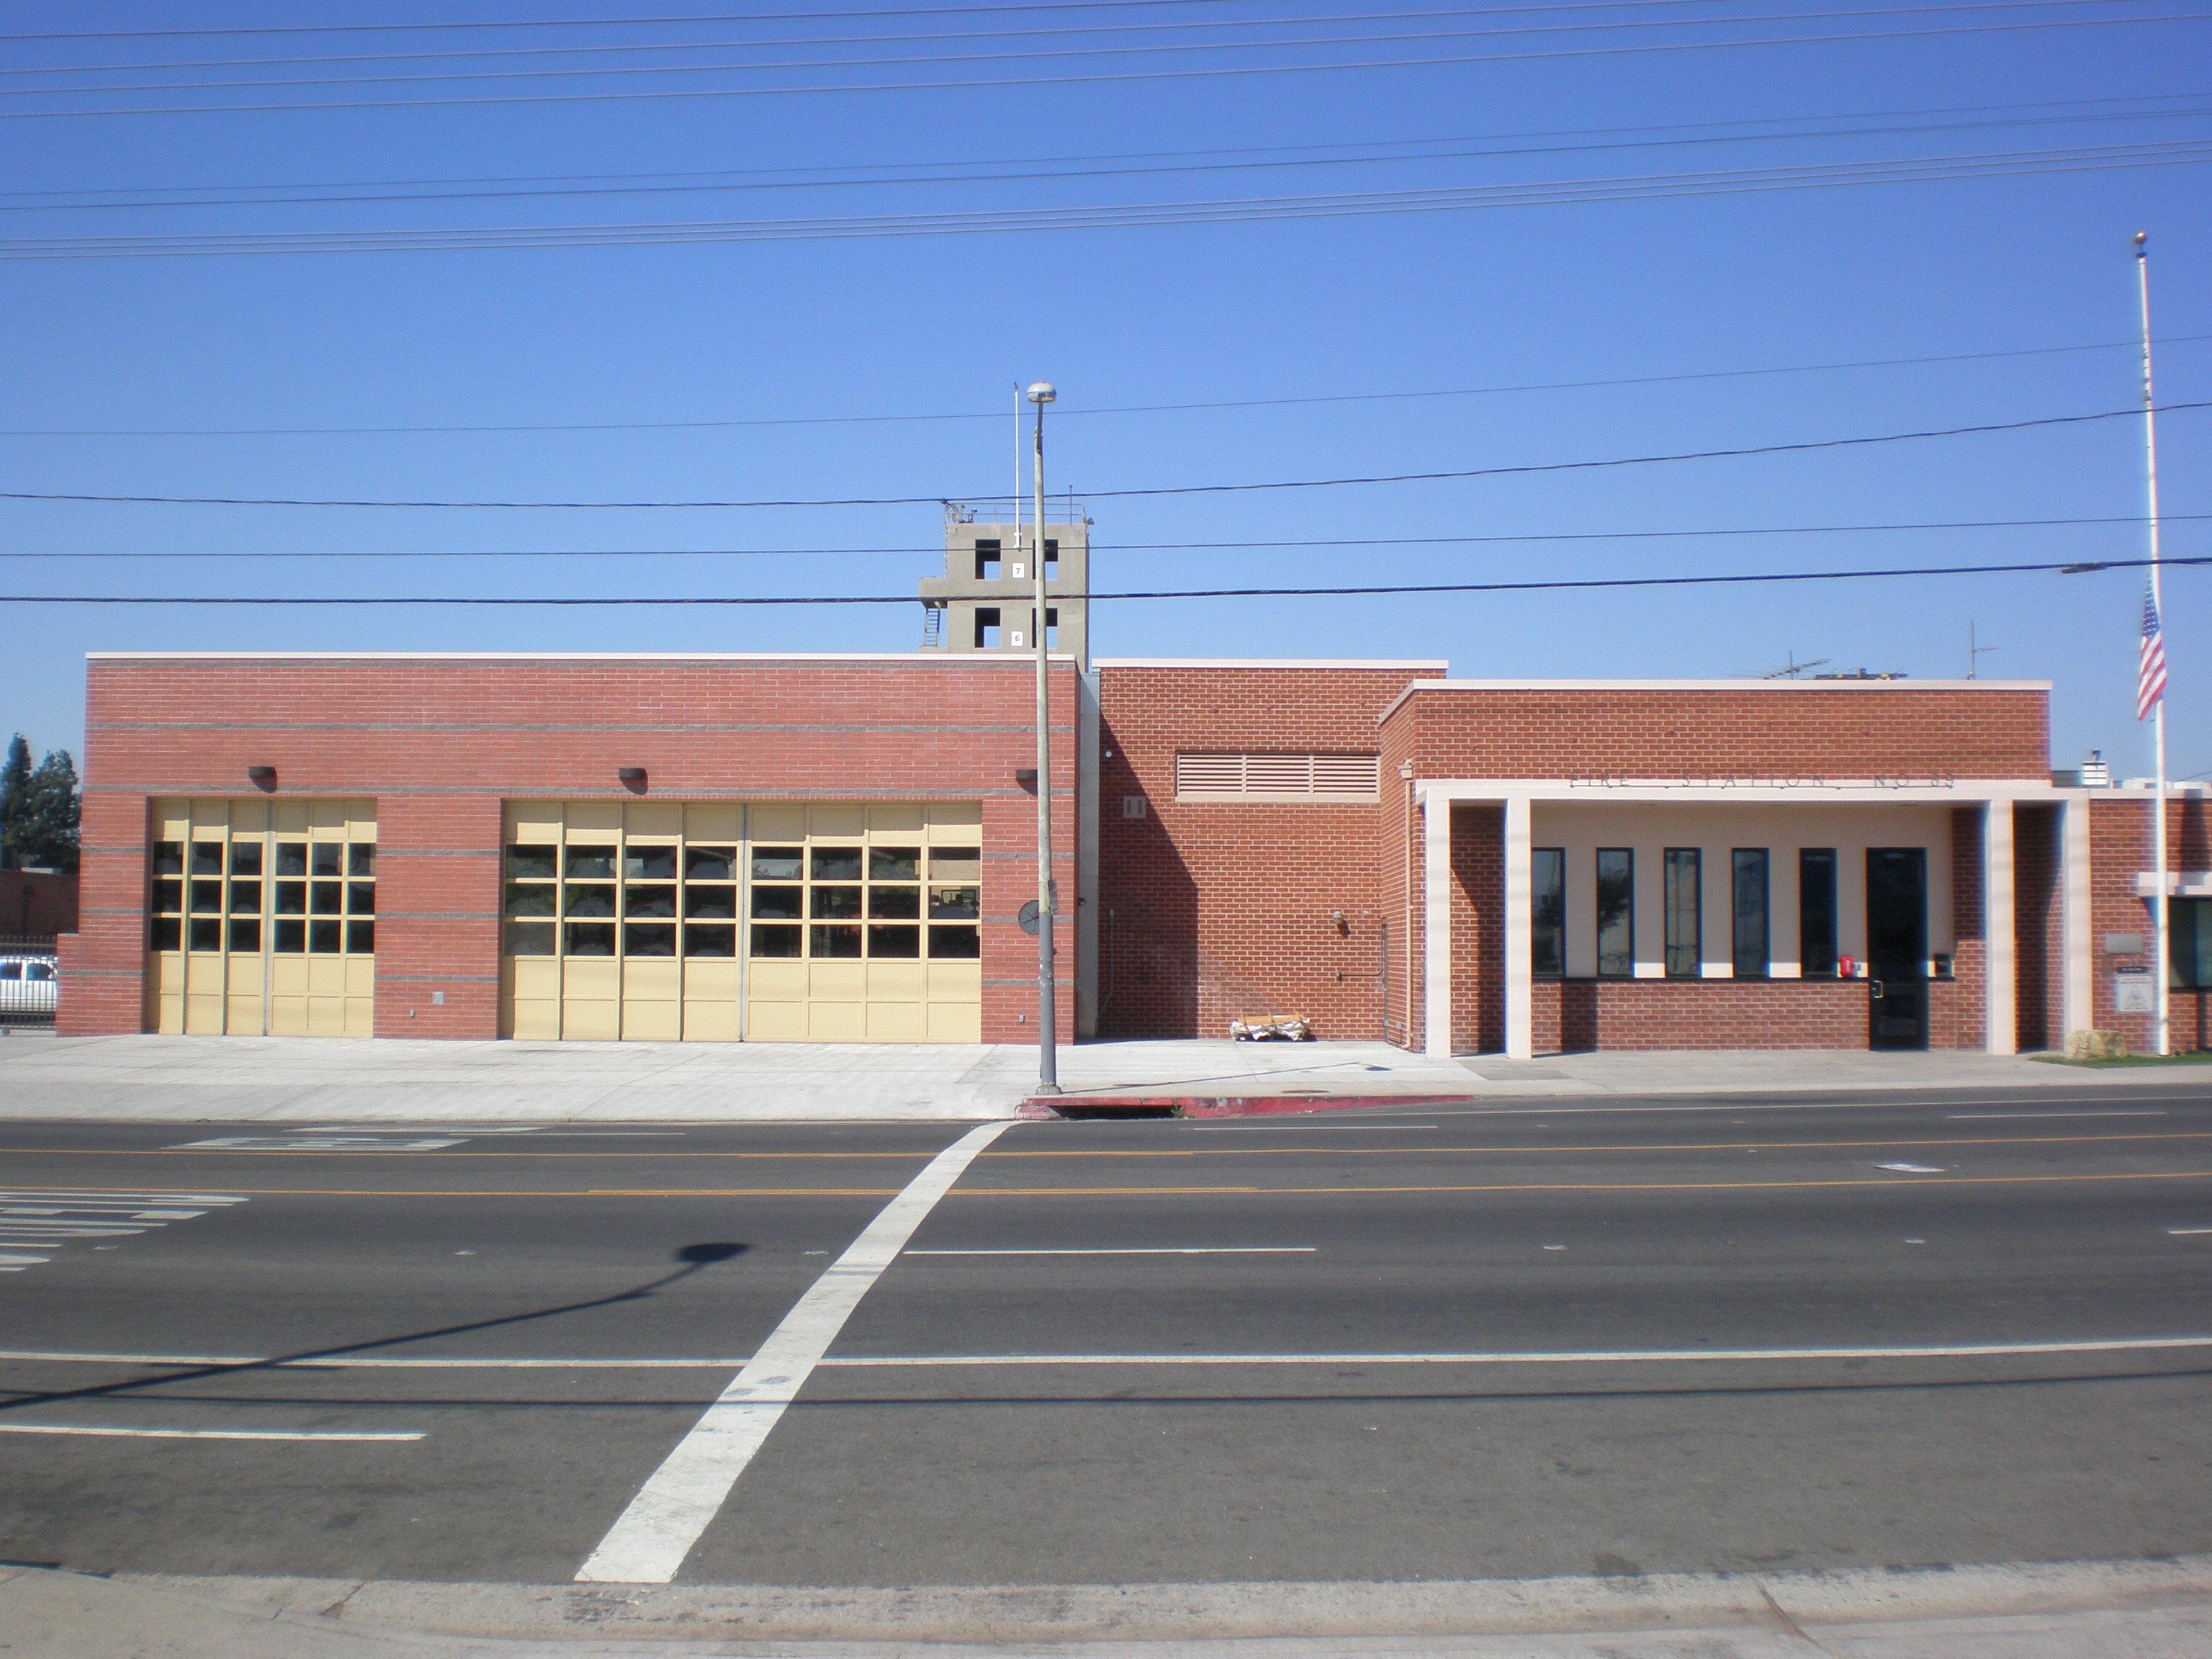 File:LAFD Station - 89 JPG - Wikimedia Commons